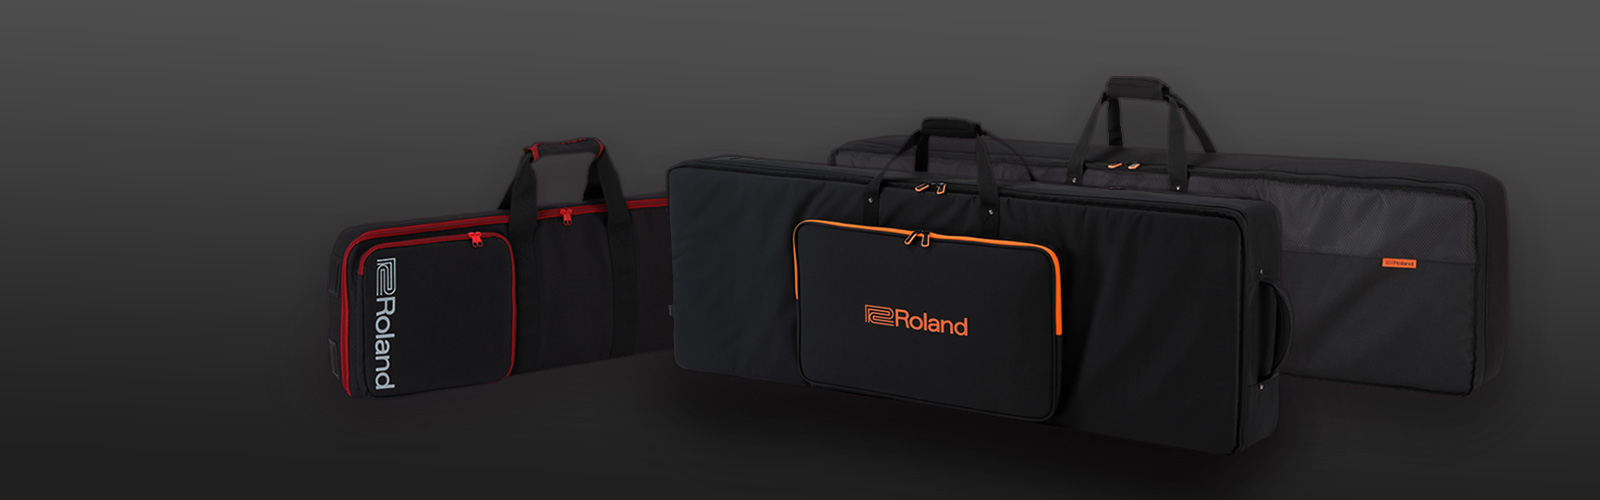 Roland Cases/Bags